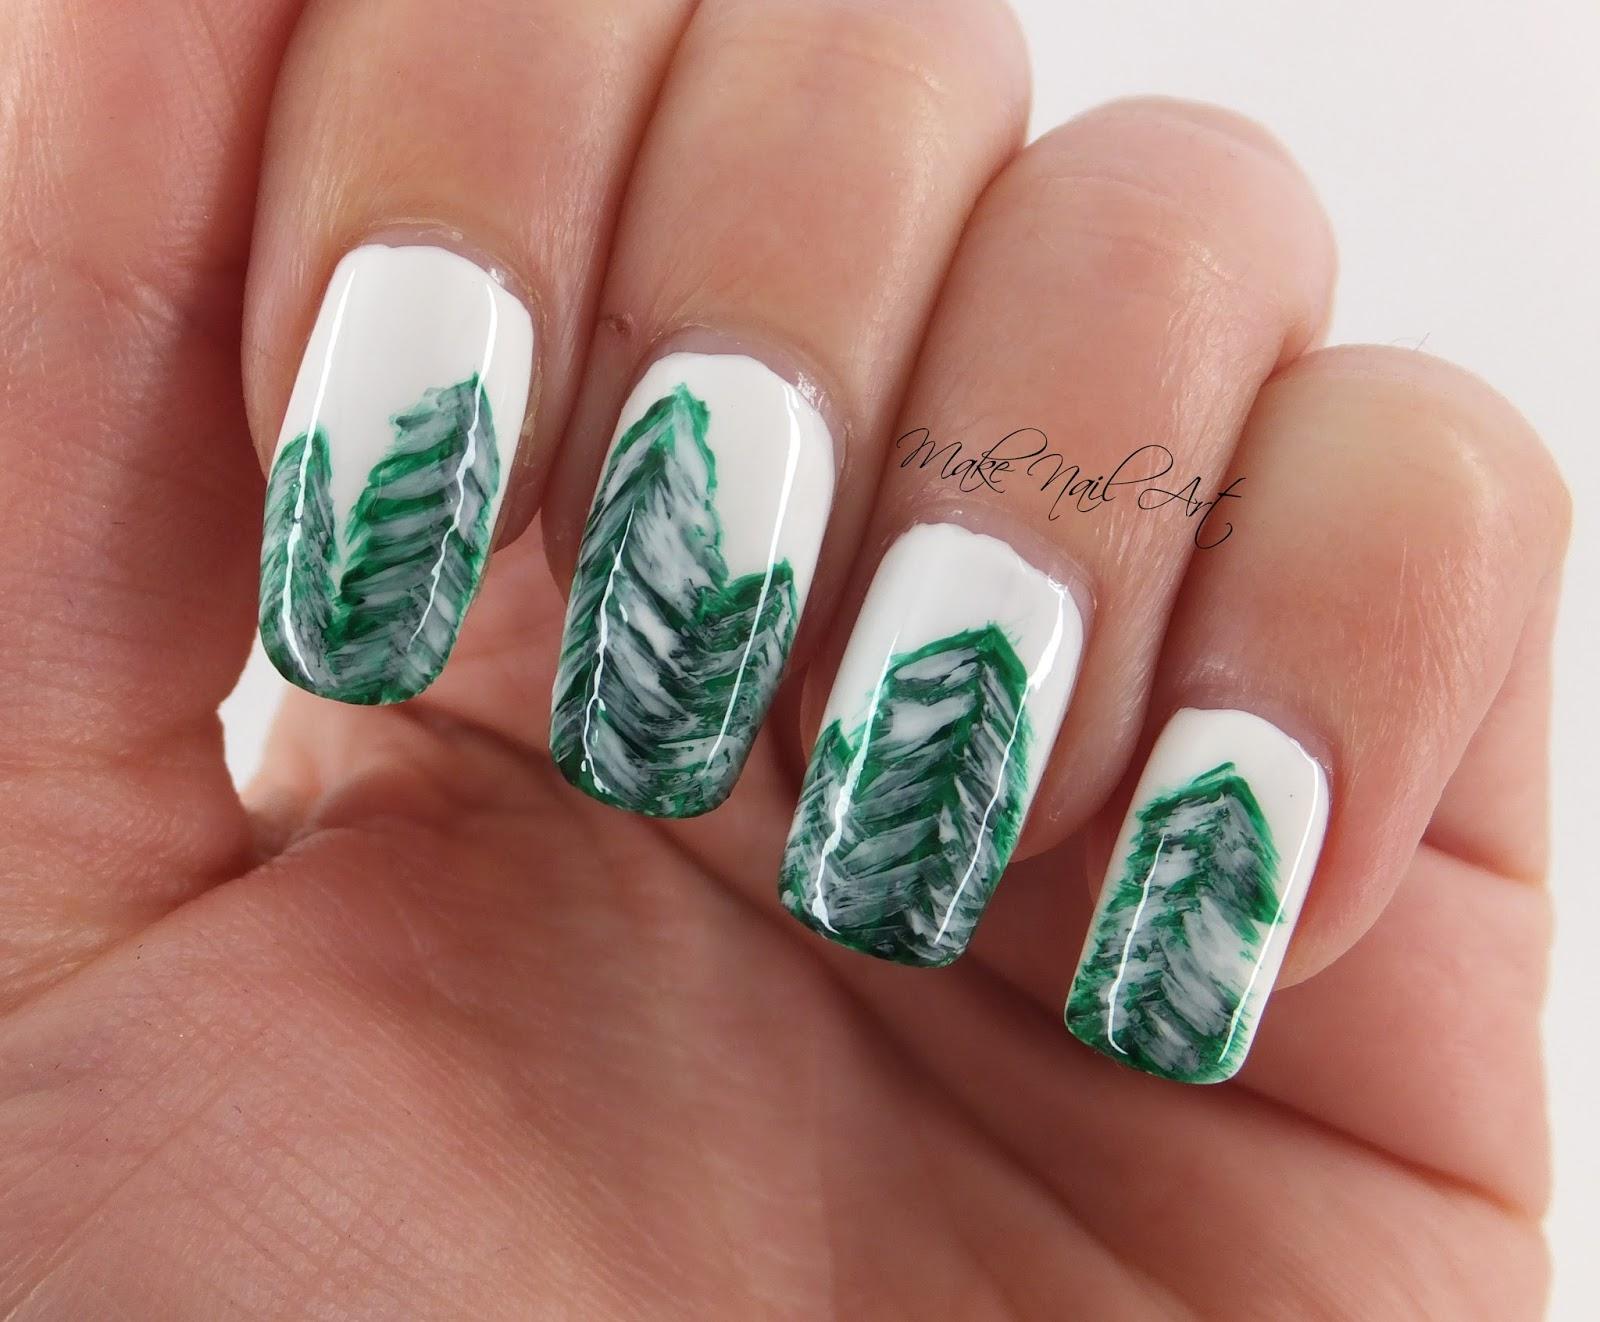 Make Nail Art Winter Forest Nail Art Design Tutorial